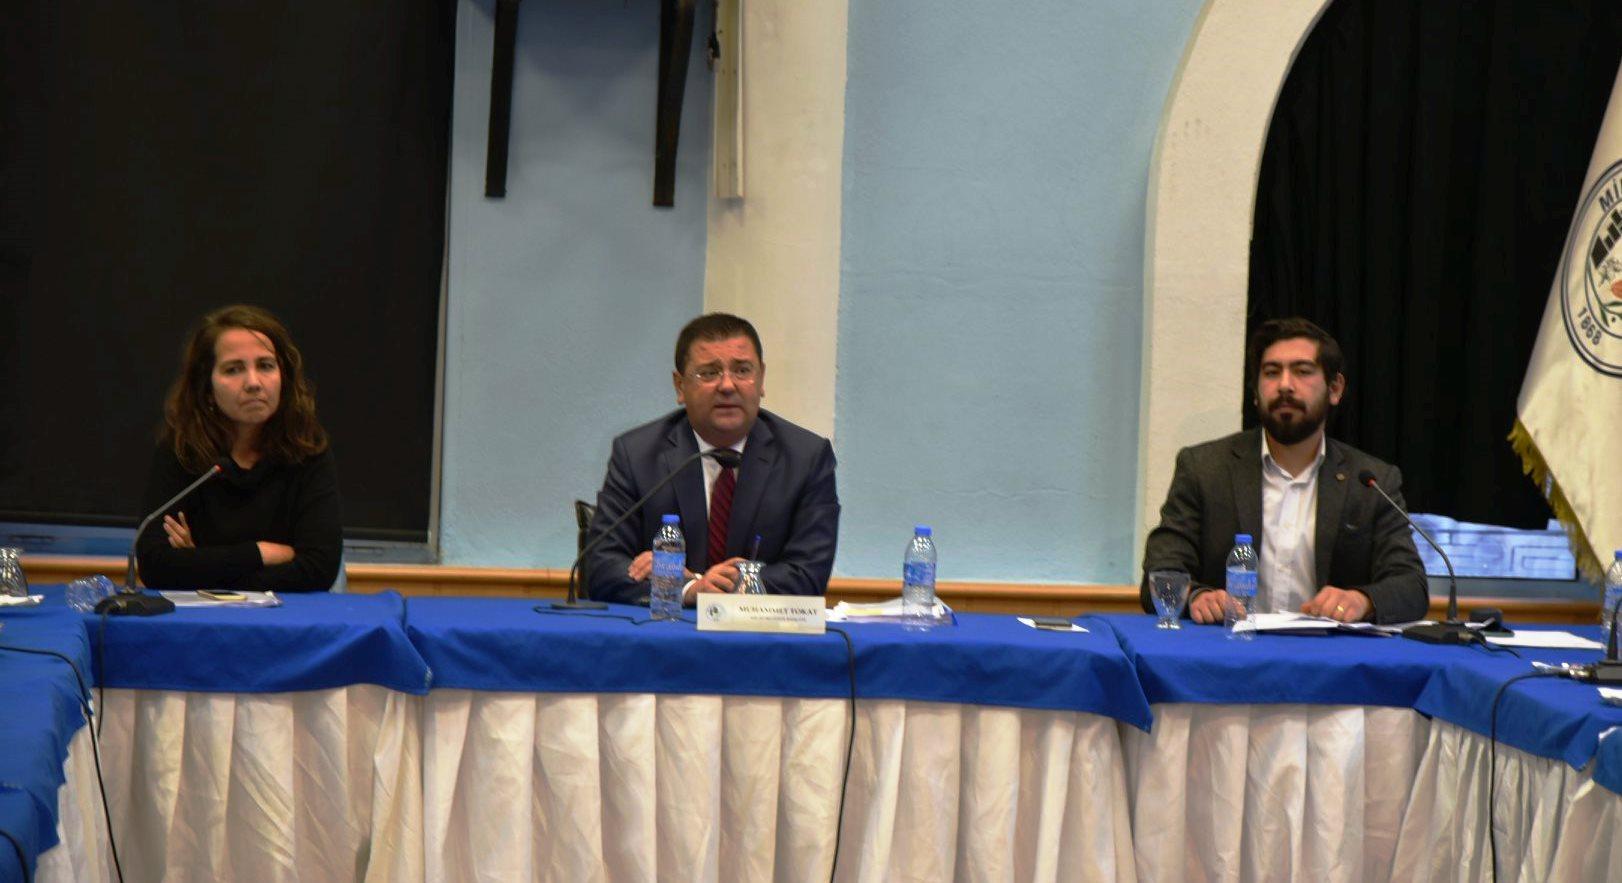 milas labranda su fabrikası Labranda Su Fabrikasına 12 milyon liralık yatırım… labranda sular   milas 2